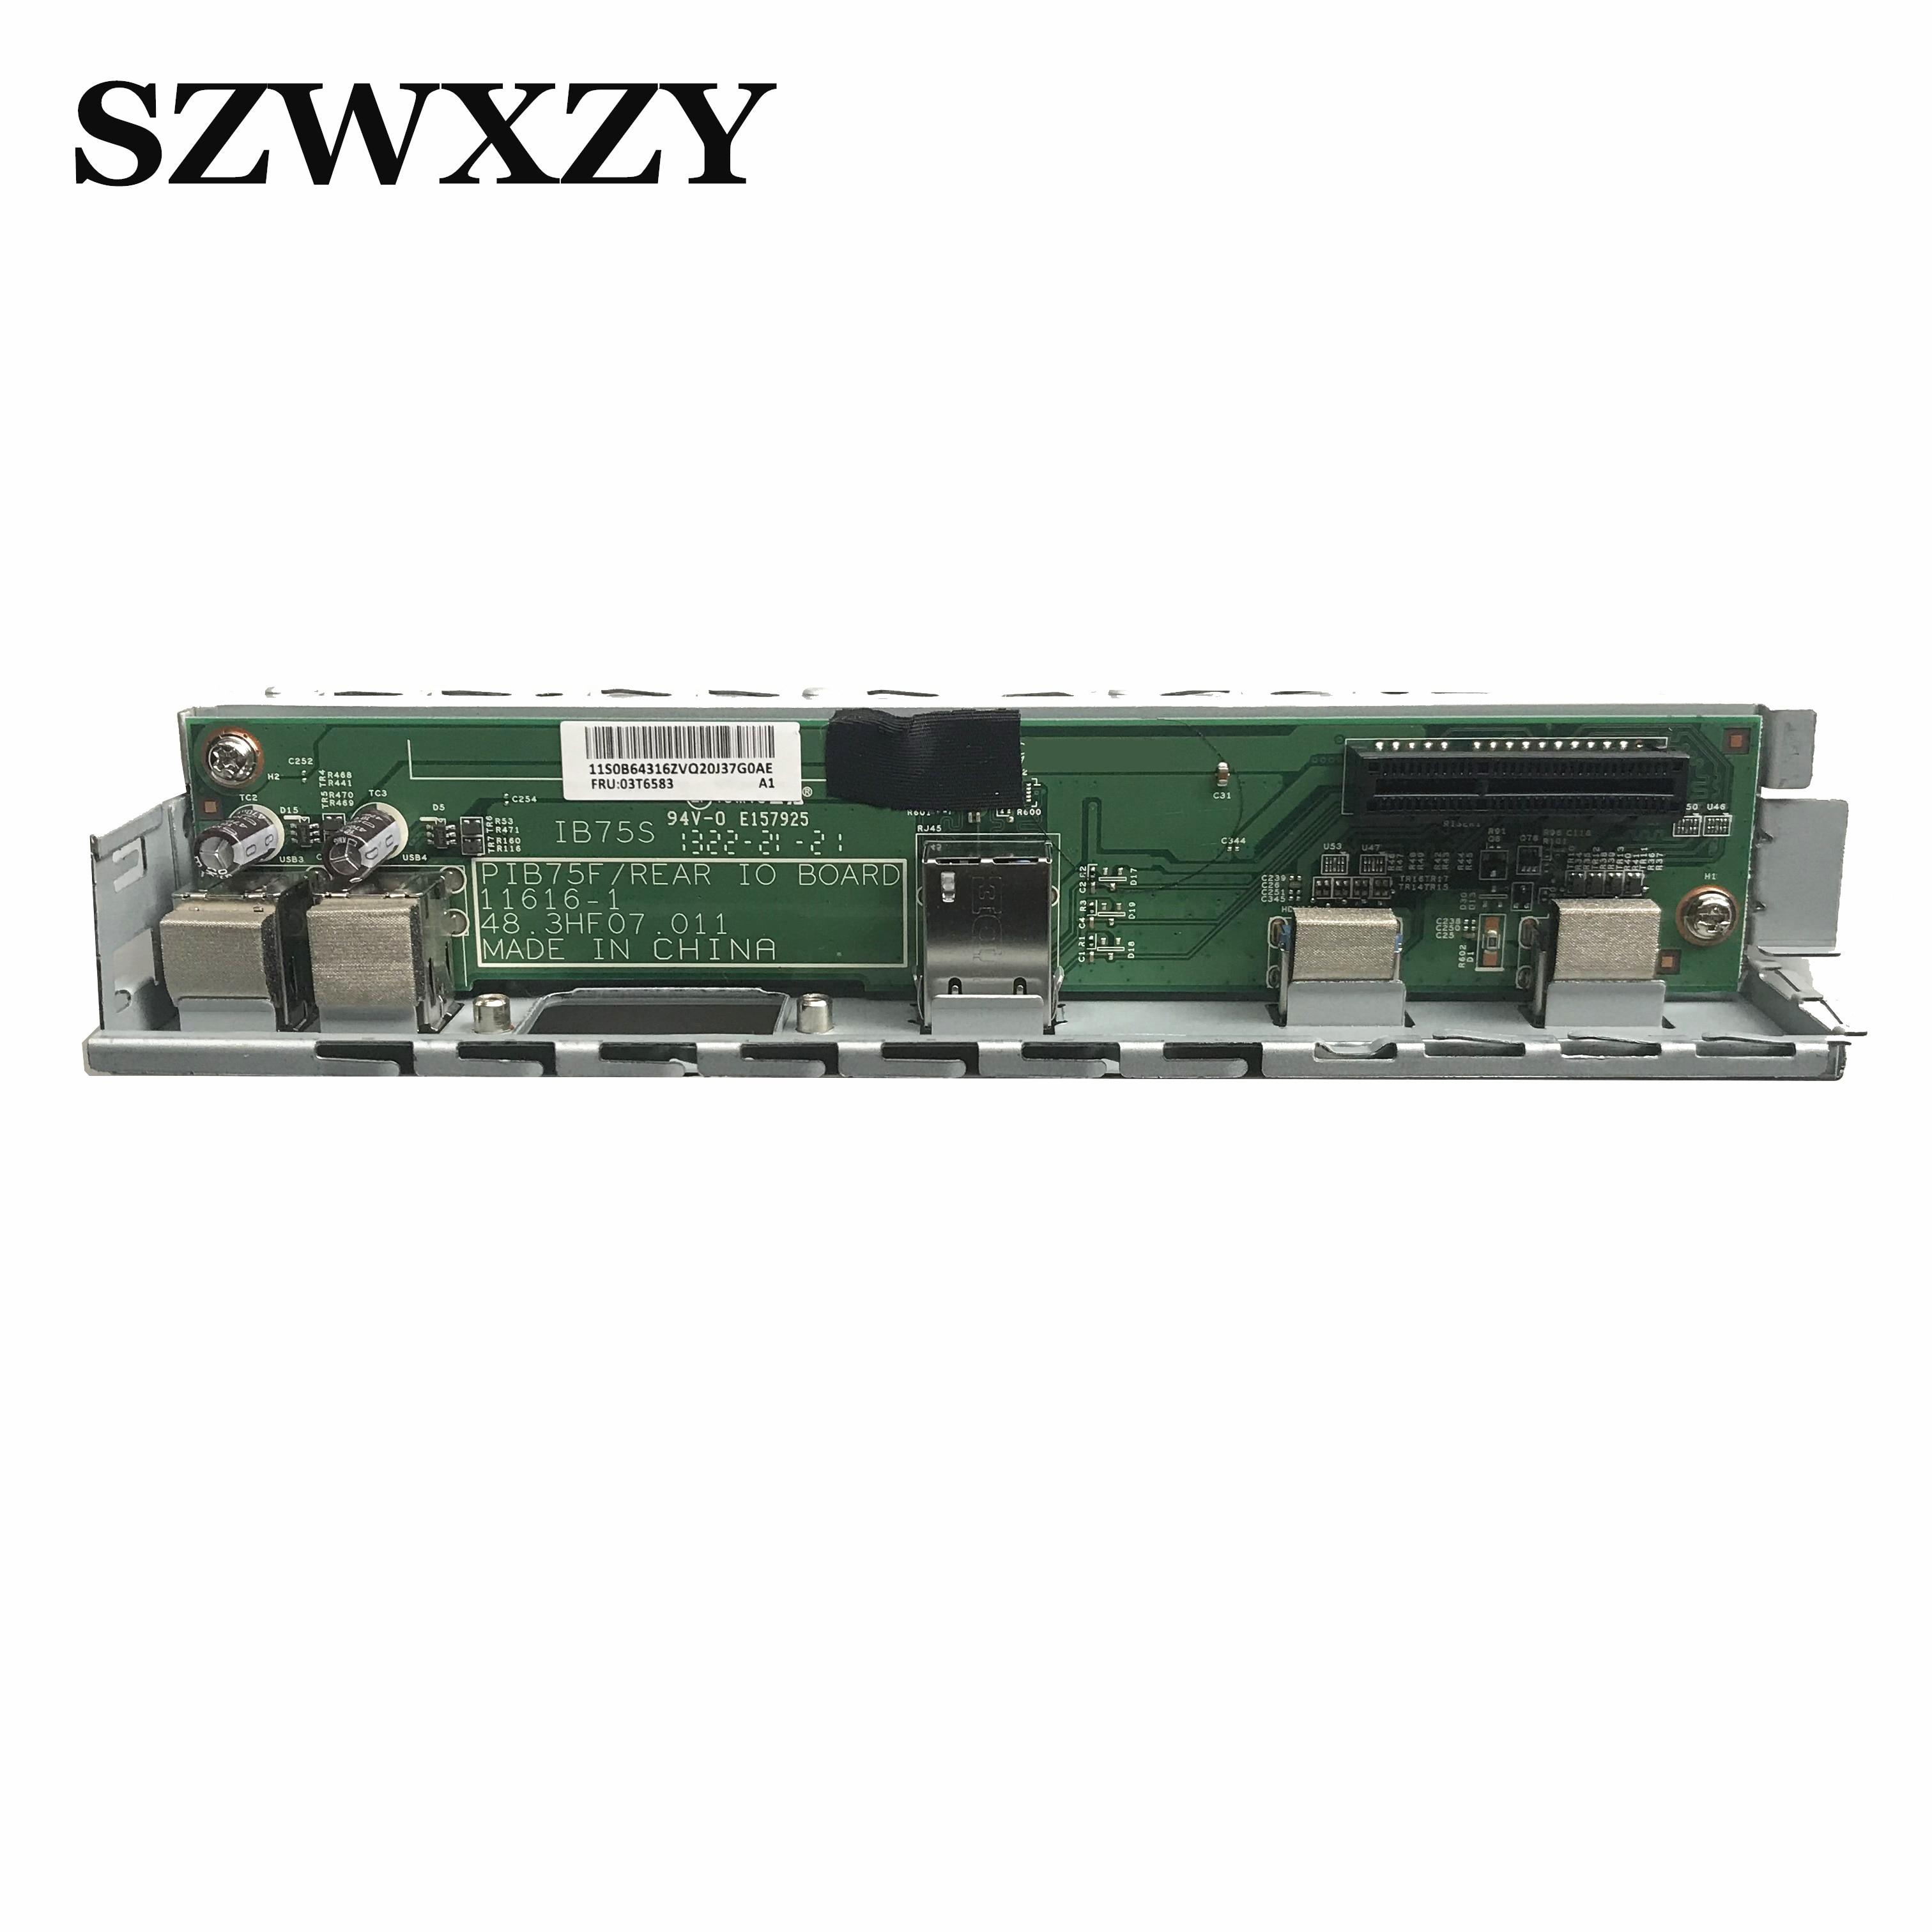 60 3HF02 001 03T6583 48 3HF07 011 For Lenovo ThinkCentre Edge 92z M92z AIO Rear USB